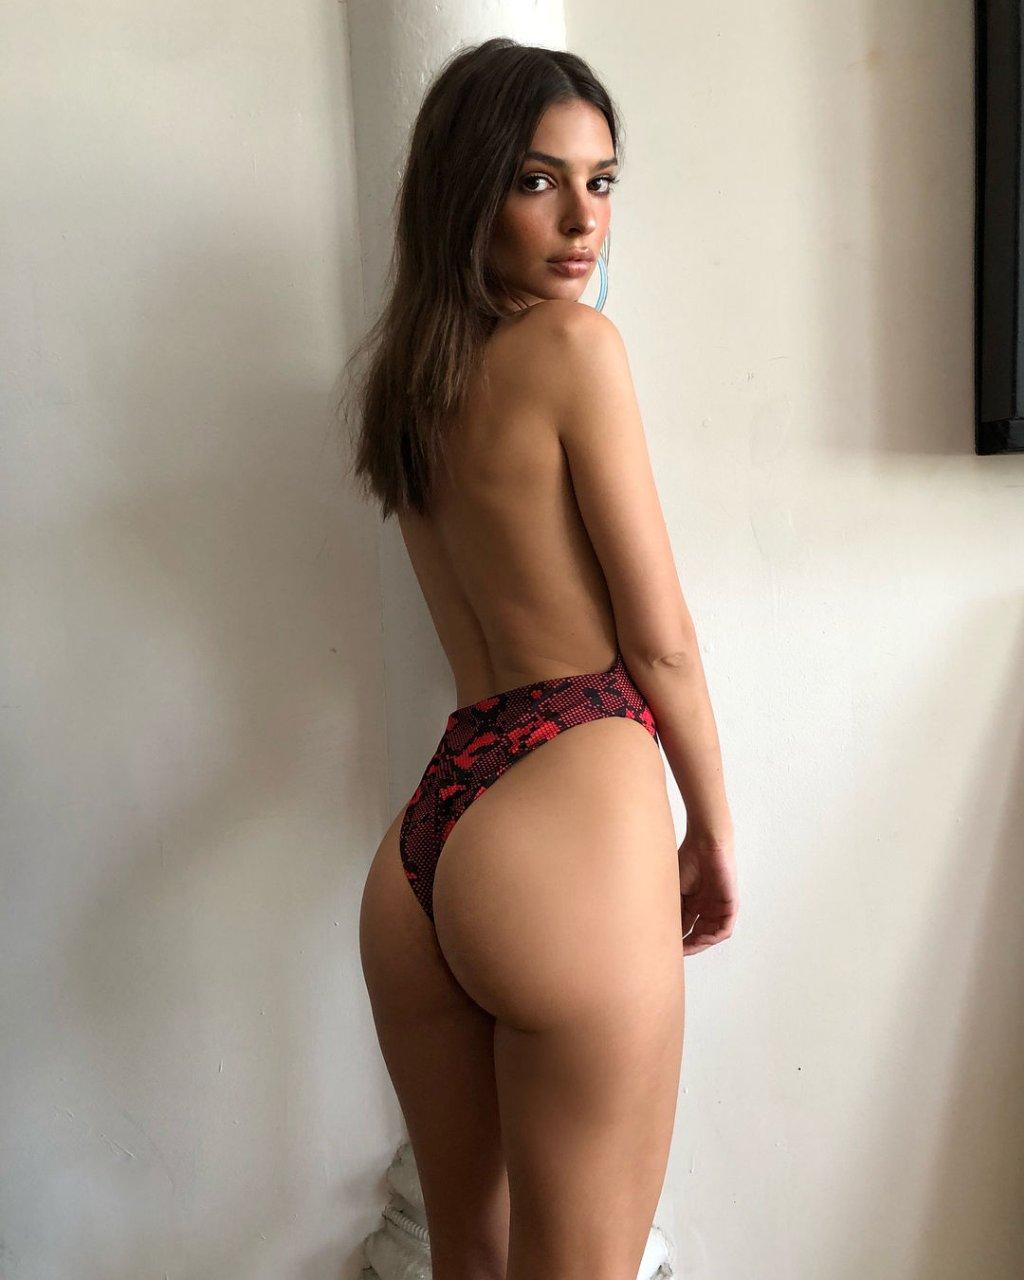 Bikini girls pics brazilian